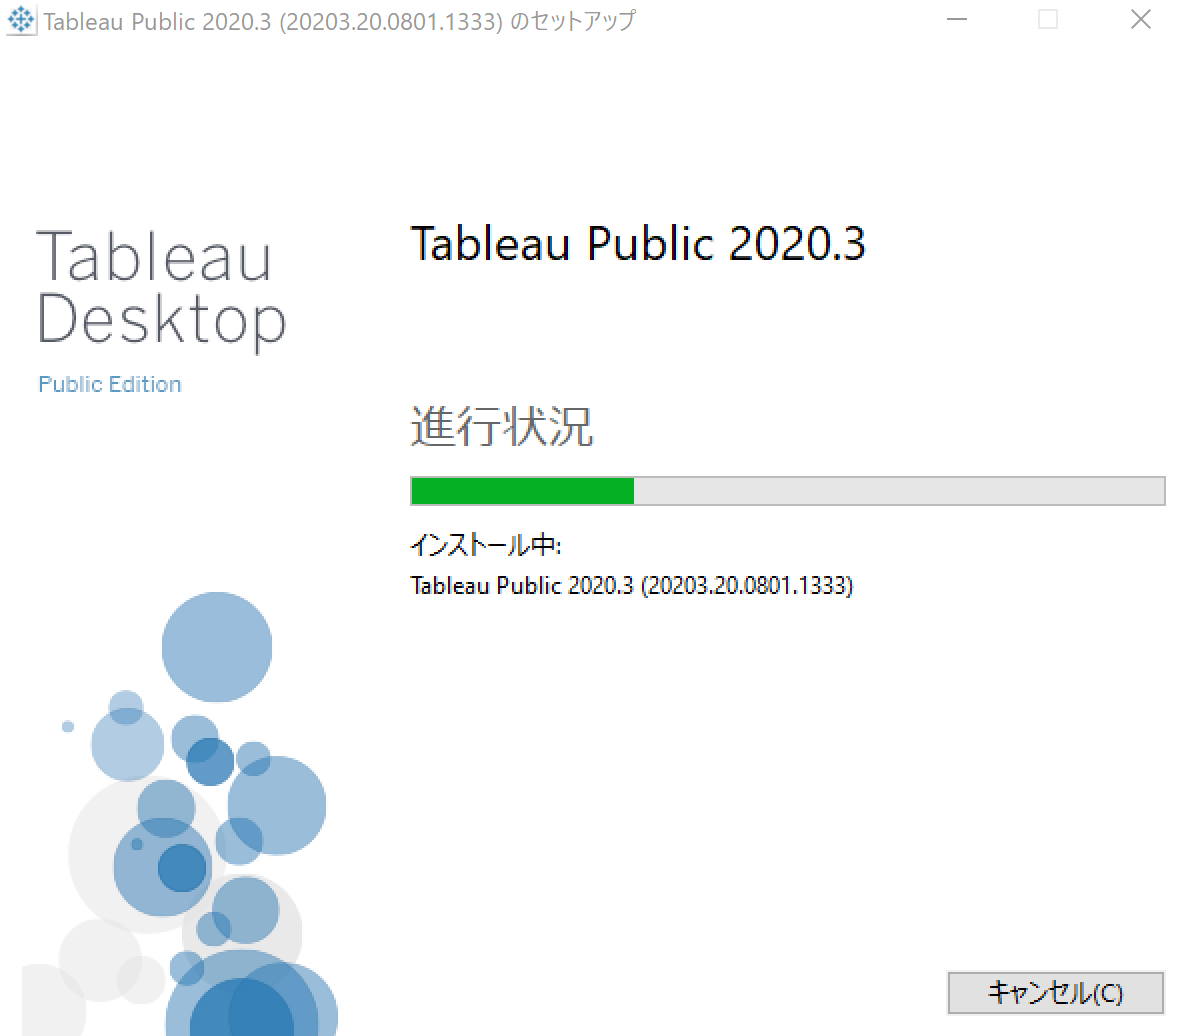 f:id:opensourcetech:20200915143923p:plain:w300